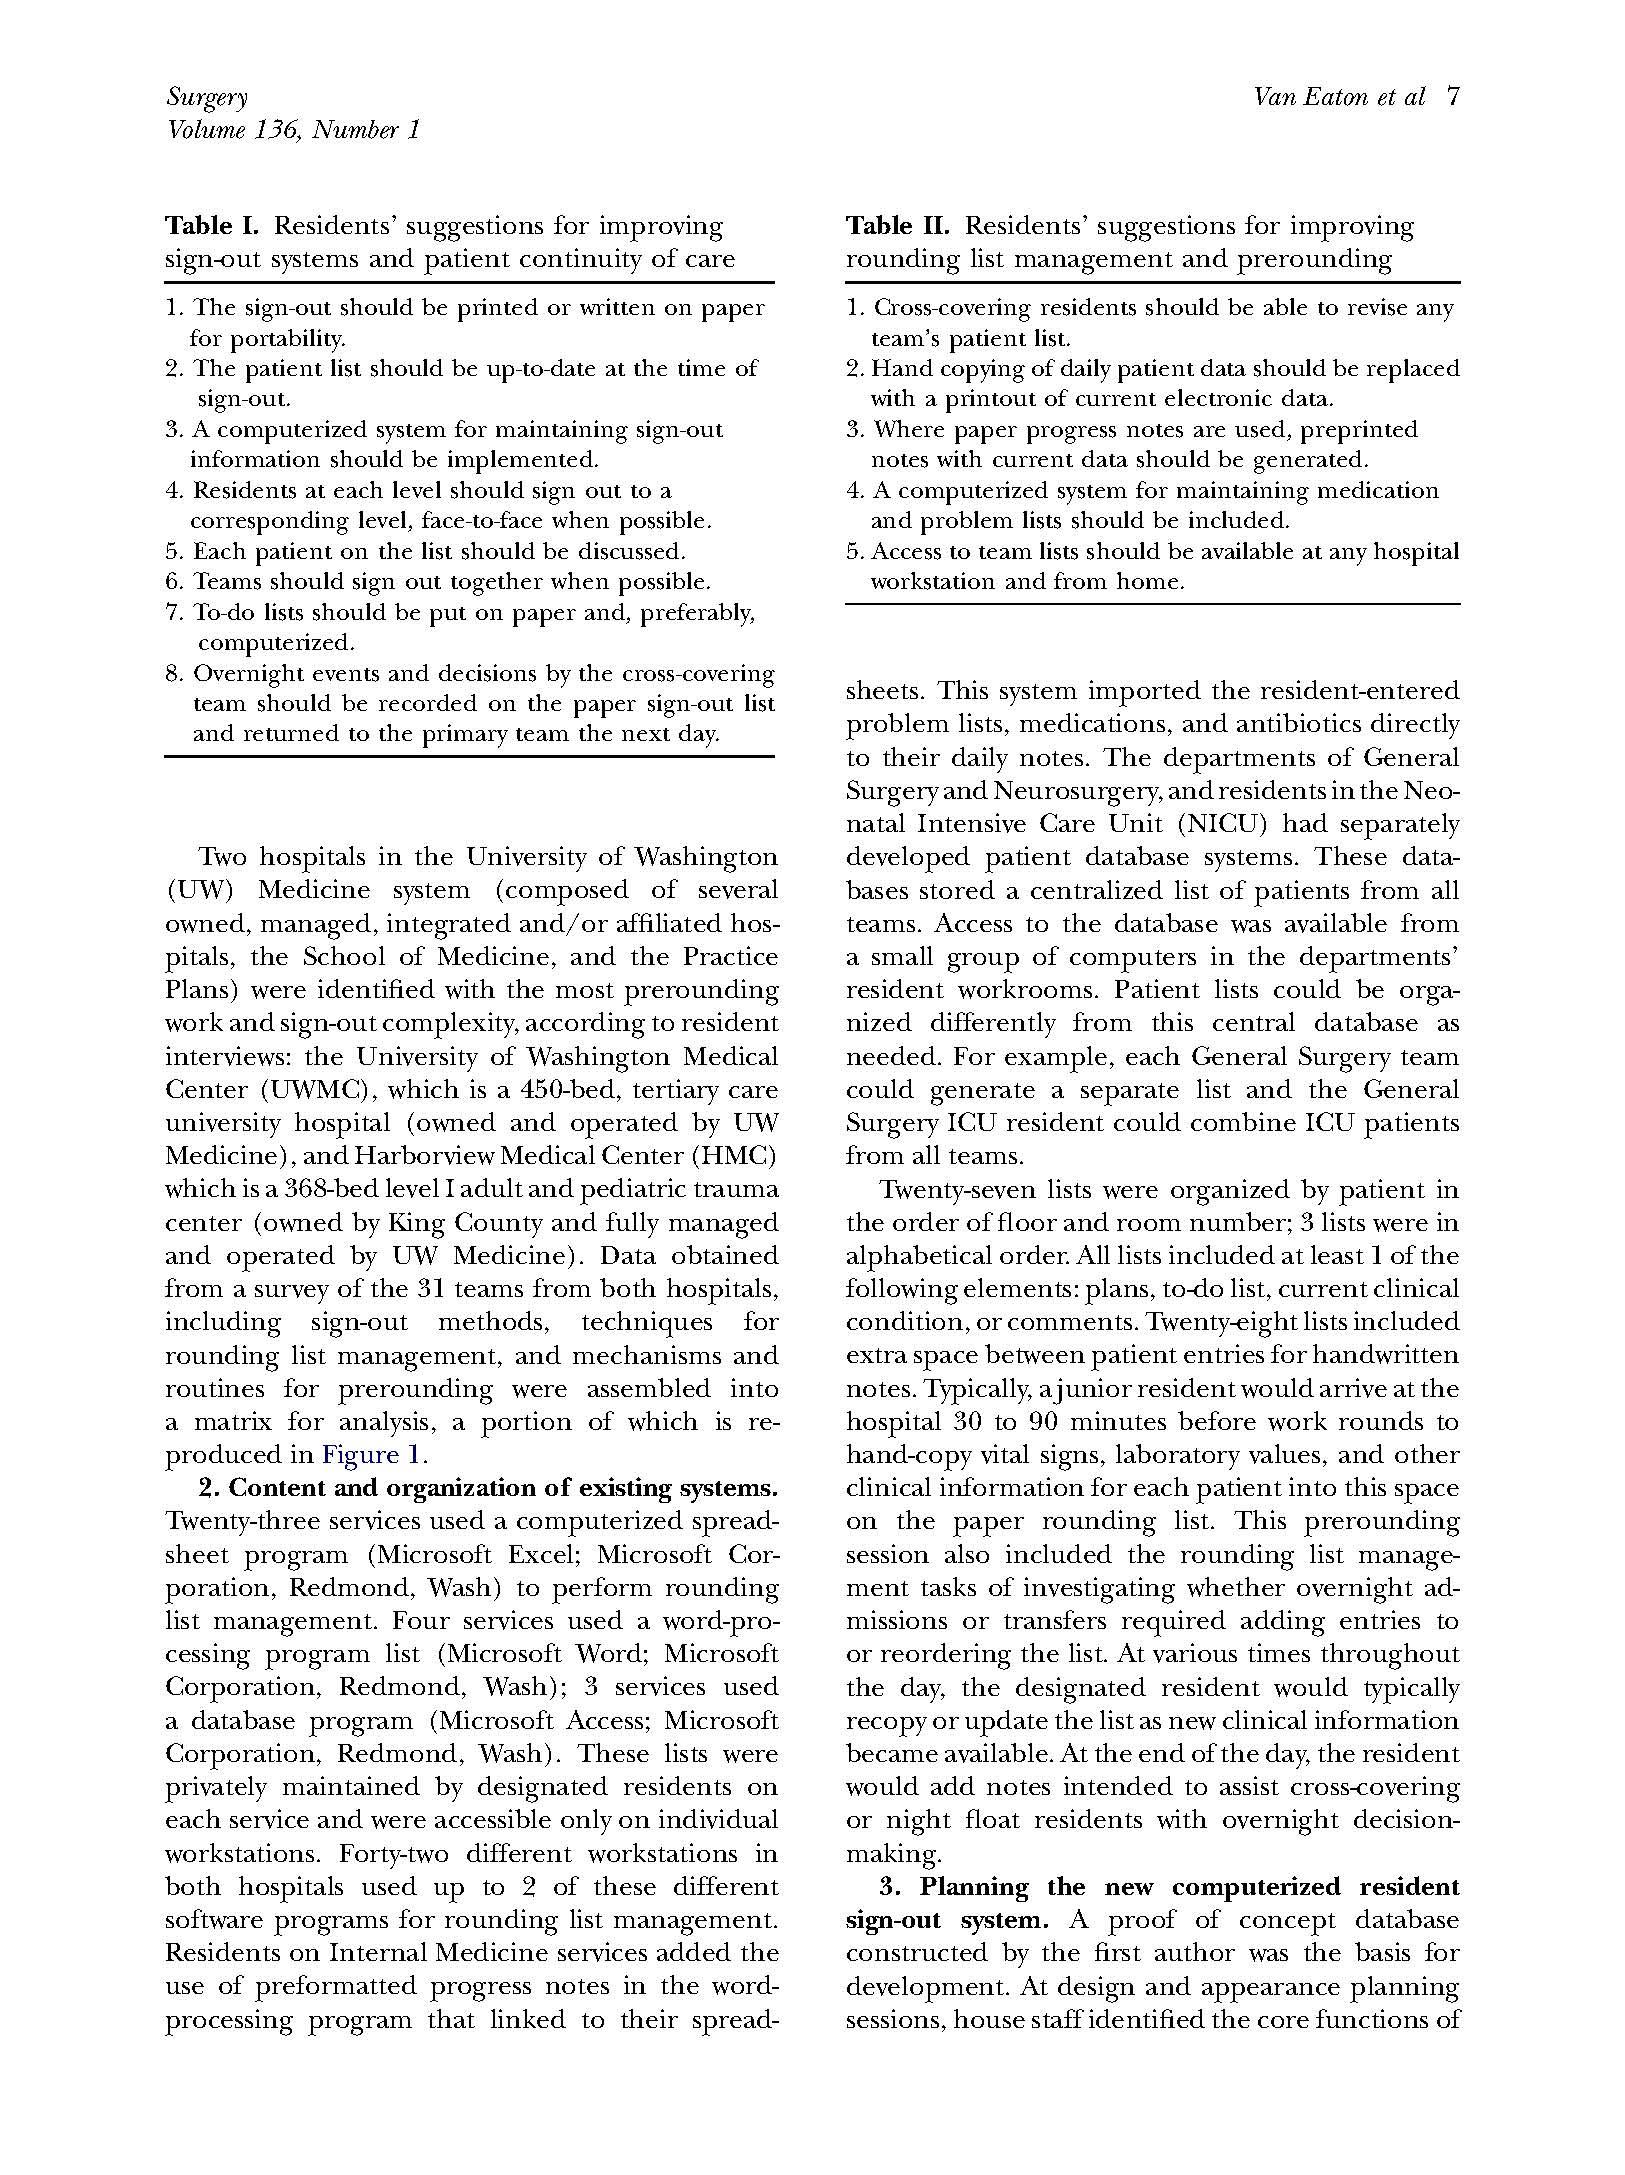 VanEatonEG-OrganizingTransferPatientCareInformation-Surgery2004_Page_3.jpg